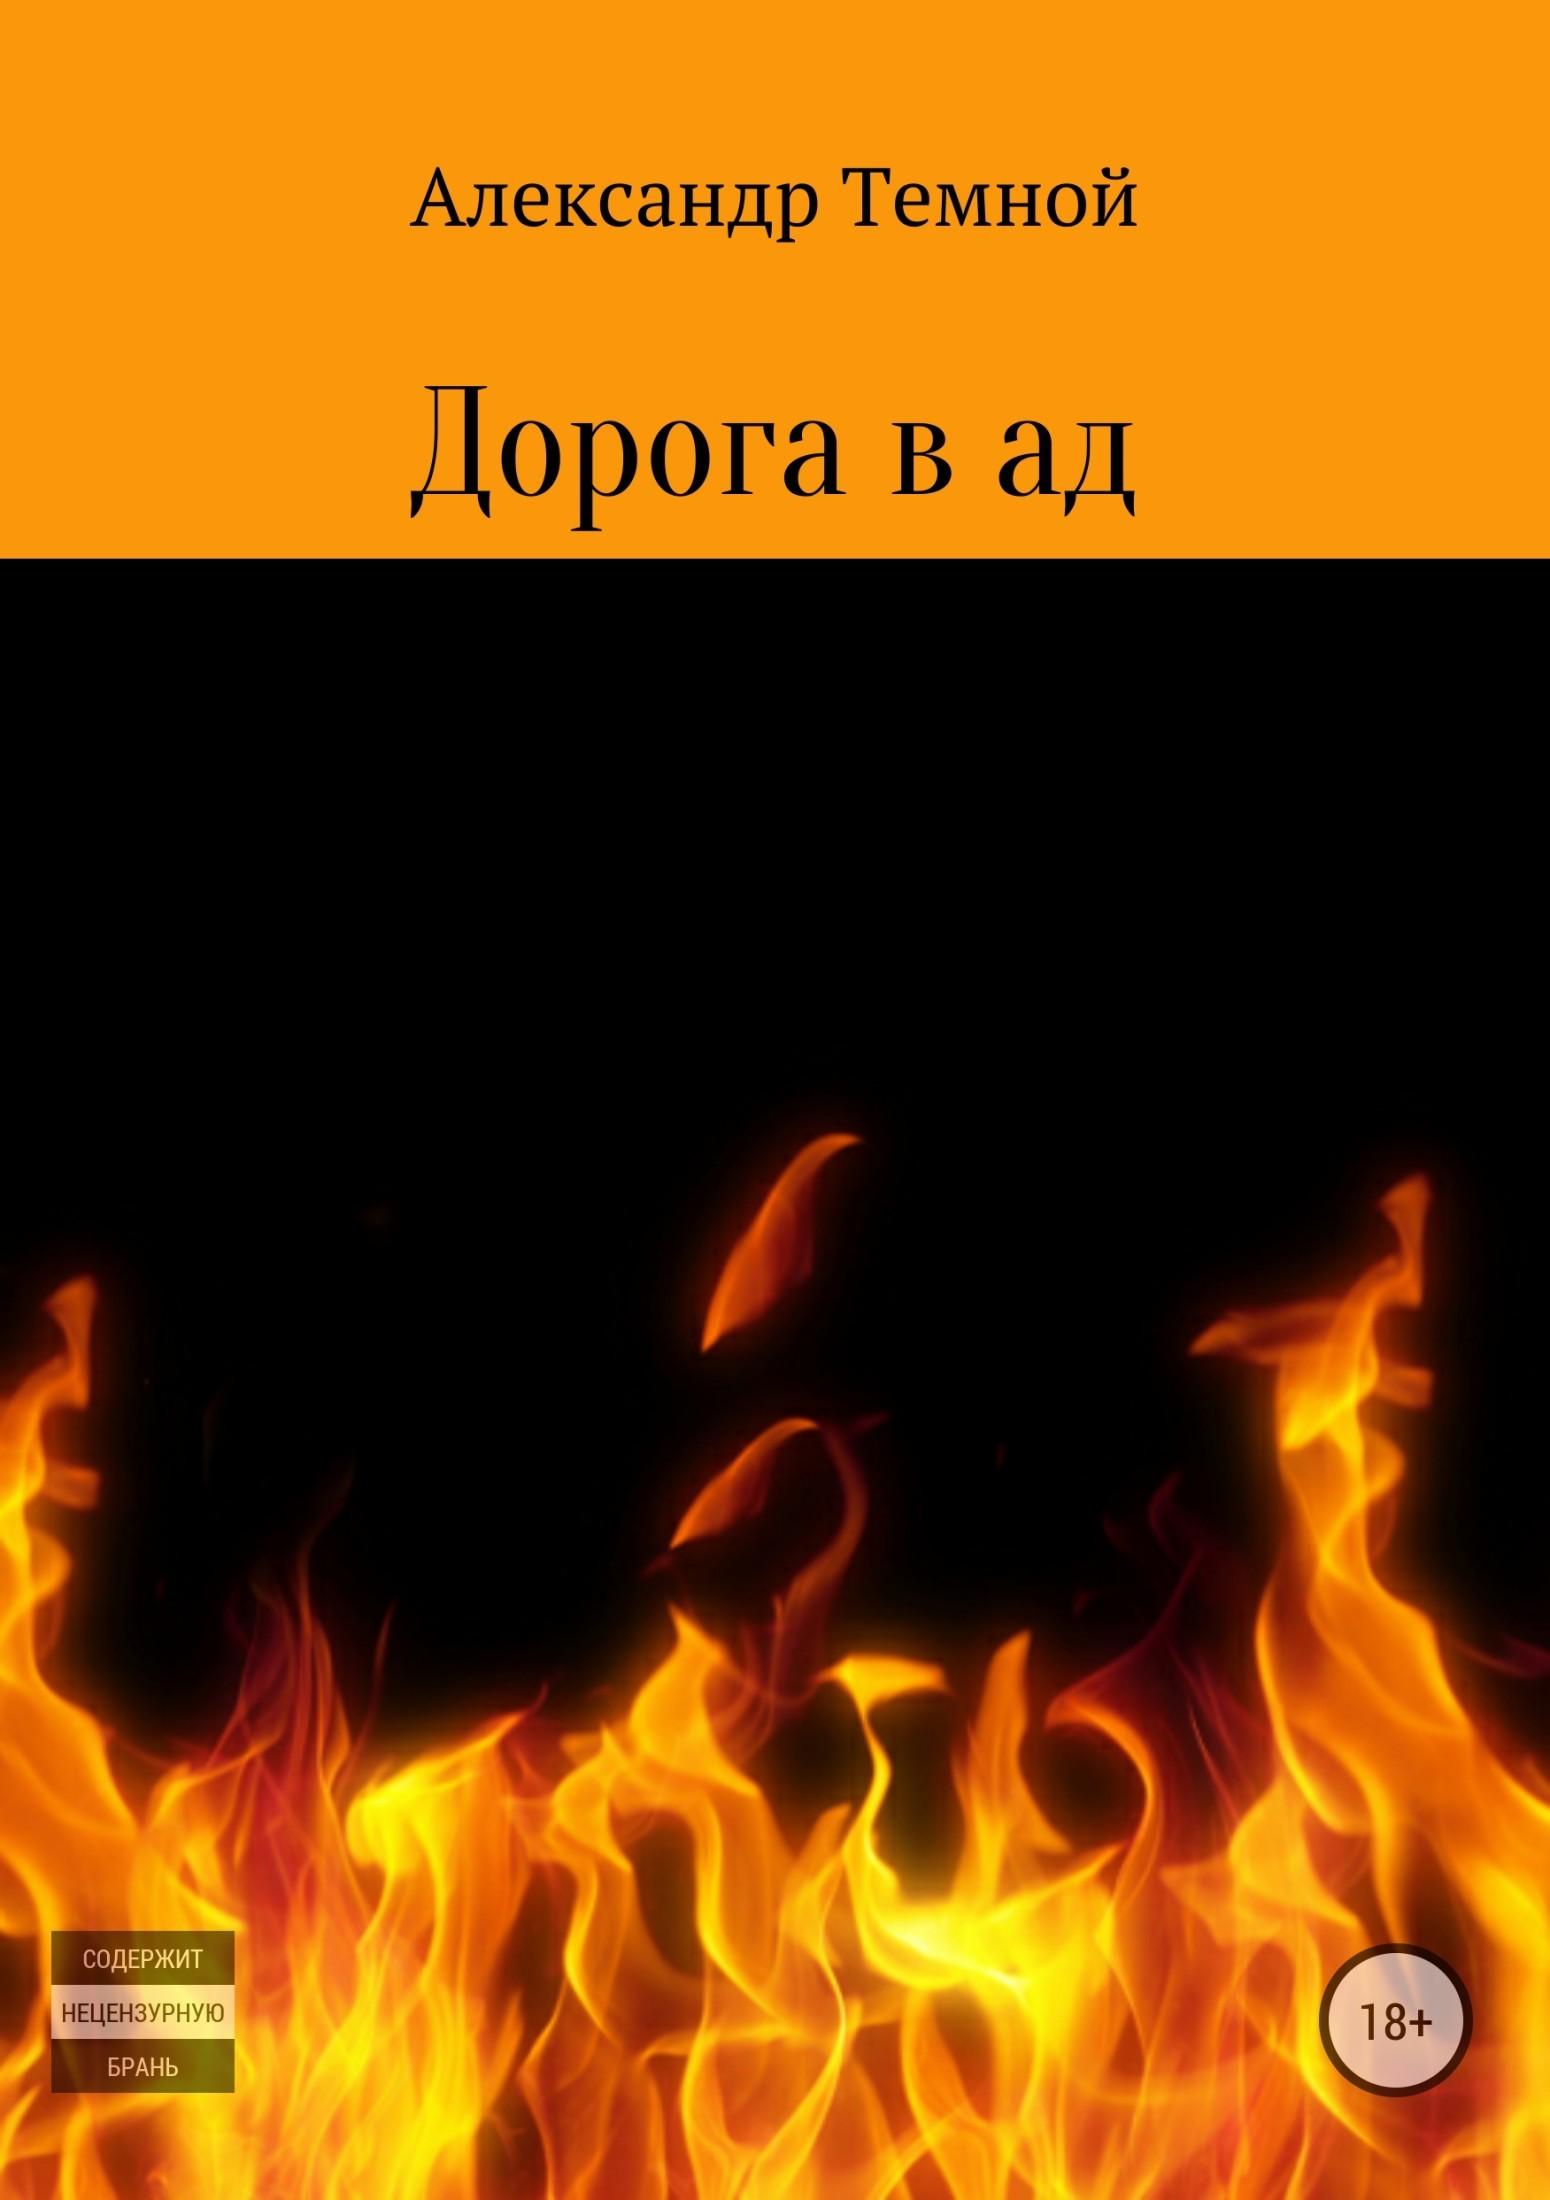 все цены на Александр Валерьевич Темной Дорога в ад онлайн